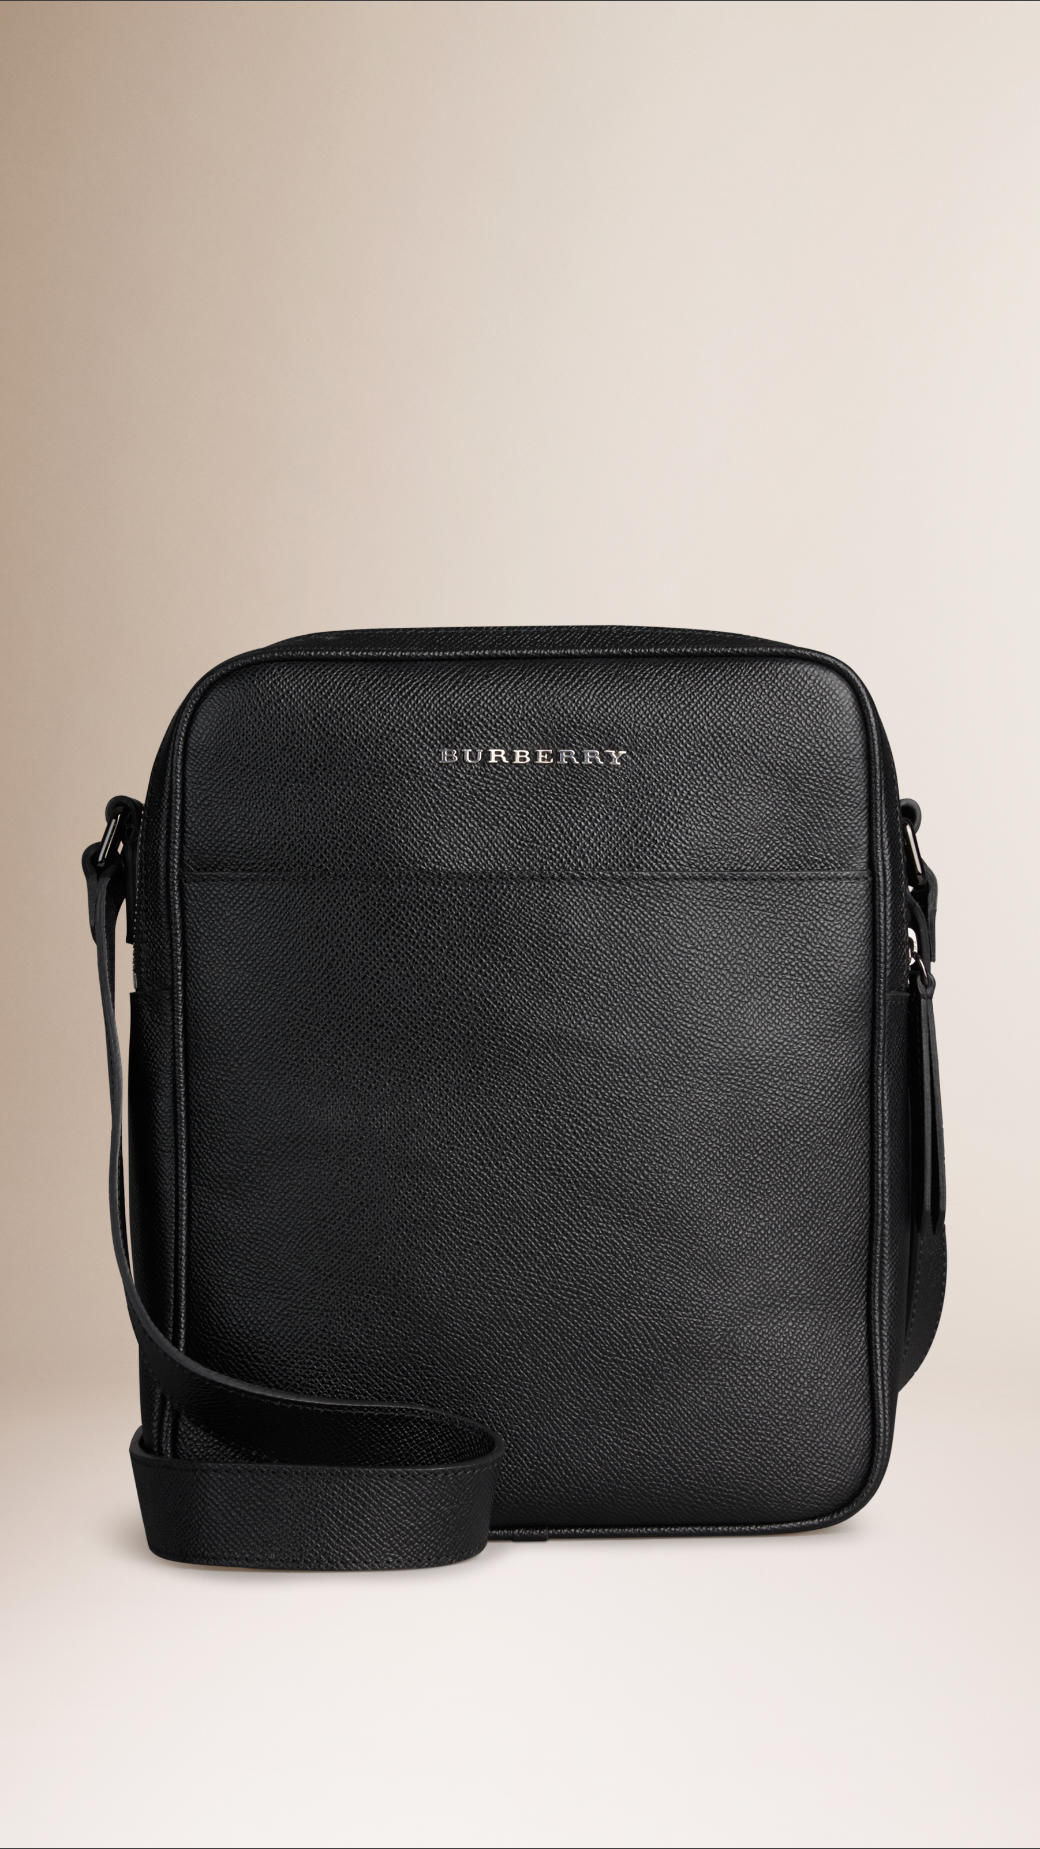 64d5d3bcc27c Lyst - Burberry London Leather Crossbody Bag in Black for Men